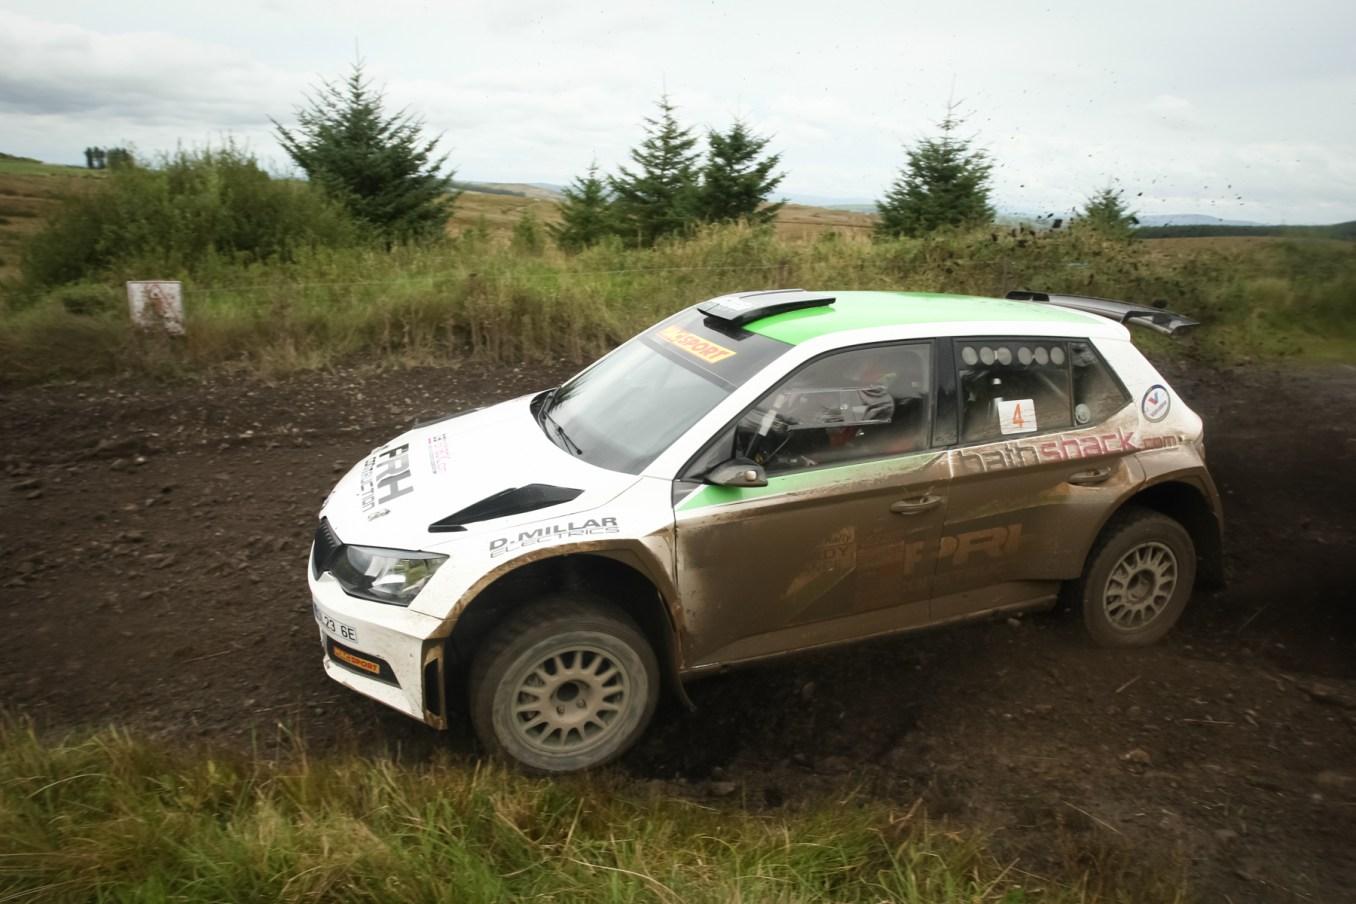 Desi Henry - Overall Bushwacker Rally Winner in his Skoda Fabia R5 (1)